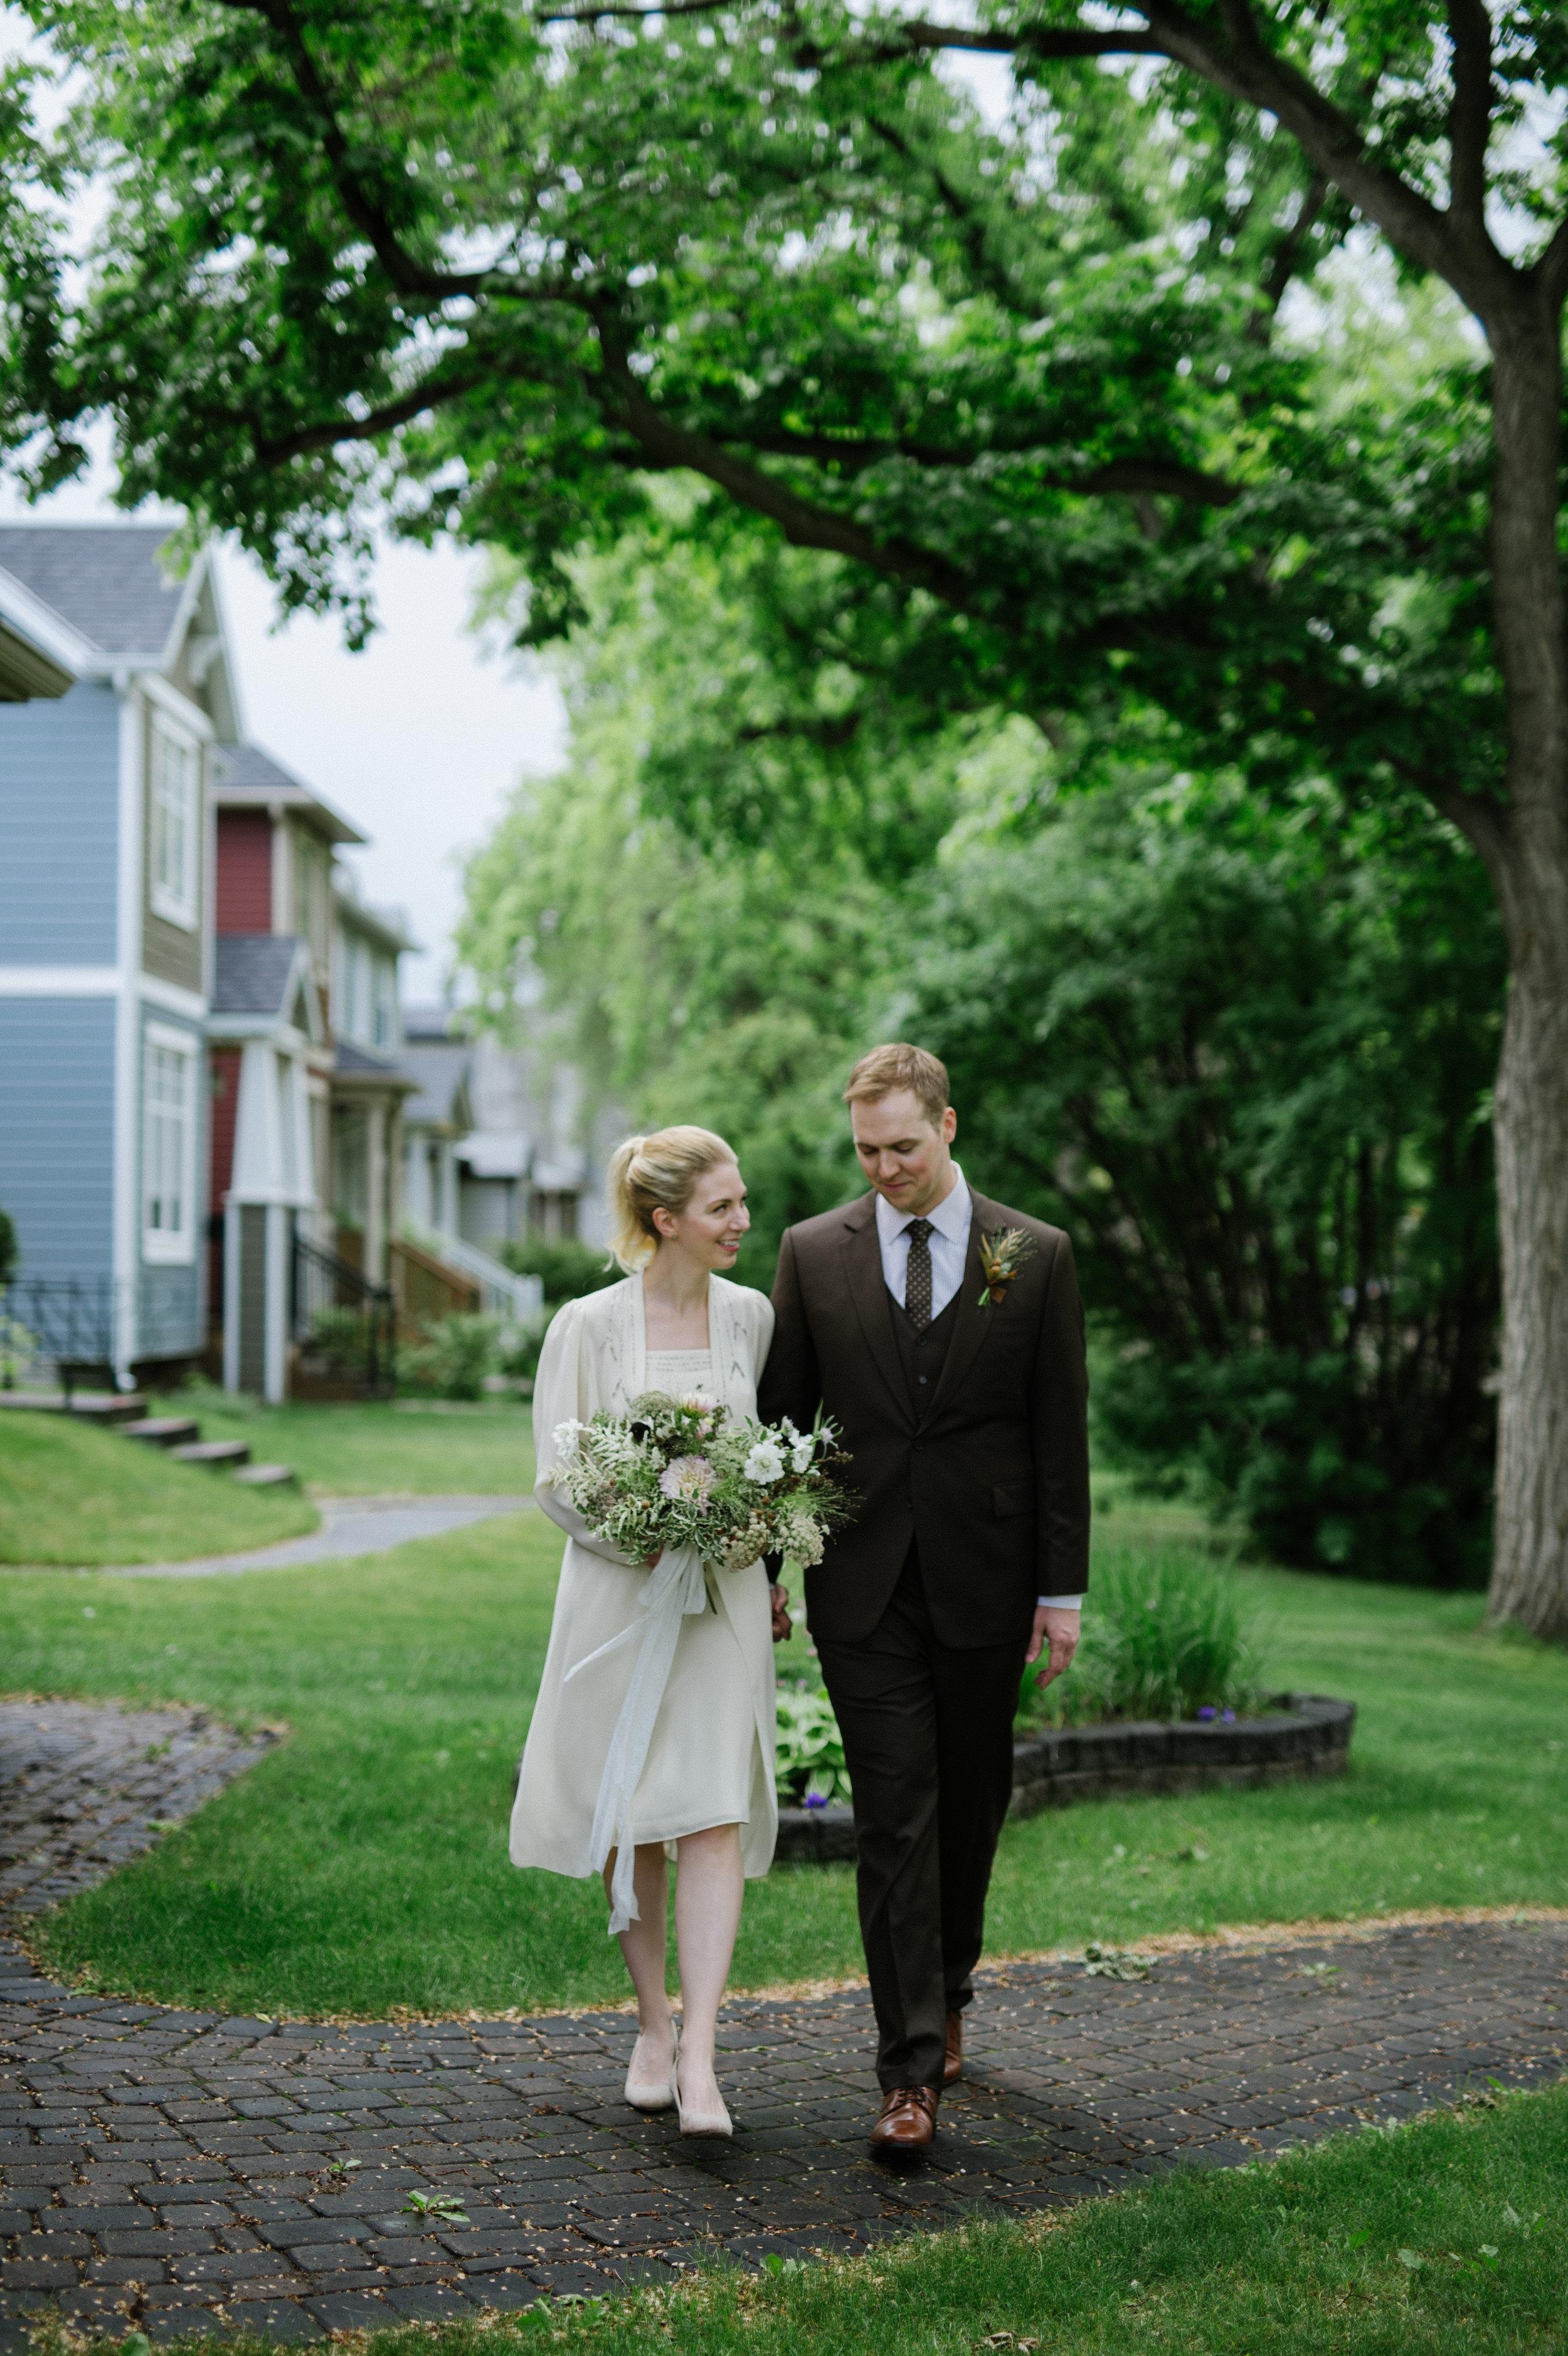 Teatro_Wedding_Calgary_Wedding_Photography_Vanessa_Tom_Married_2018_HR002.jpg